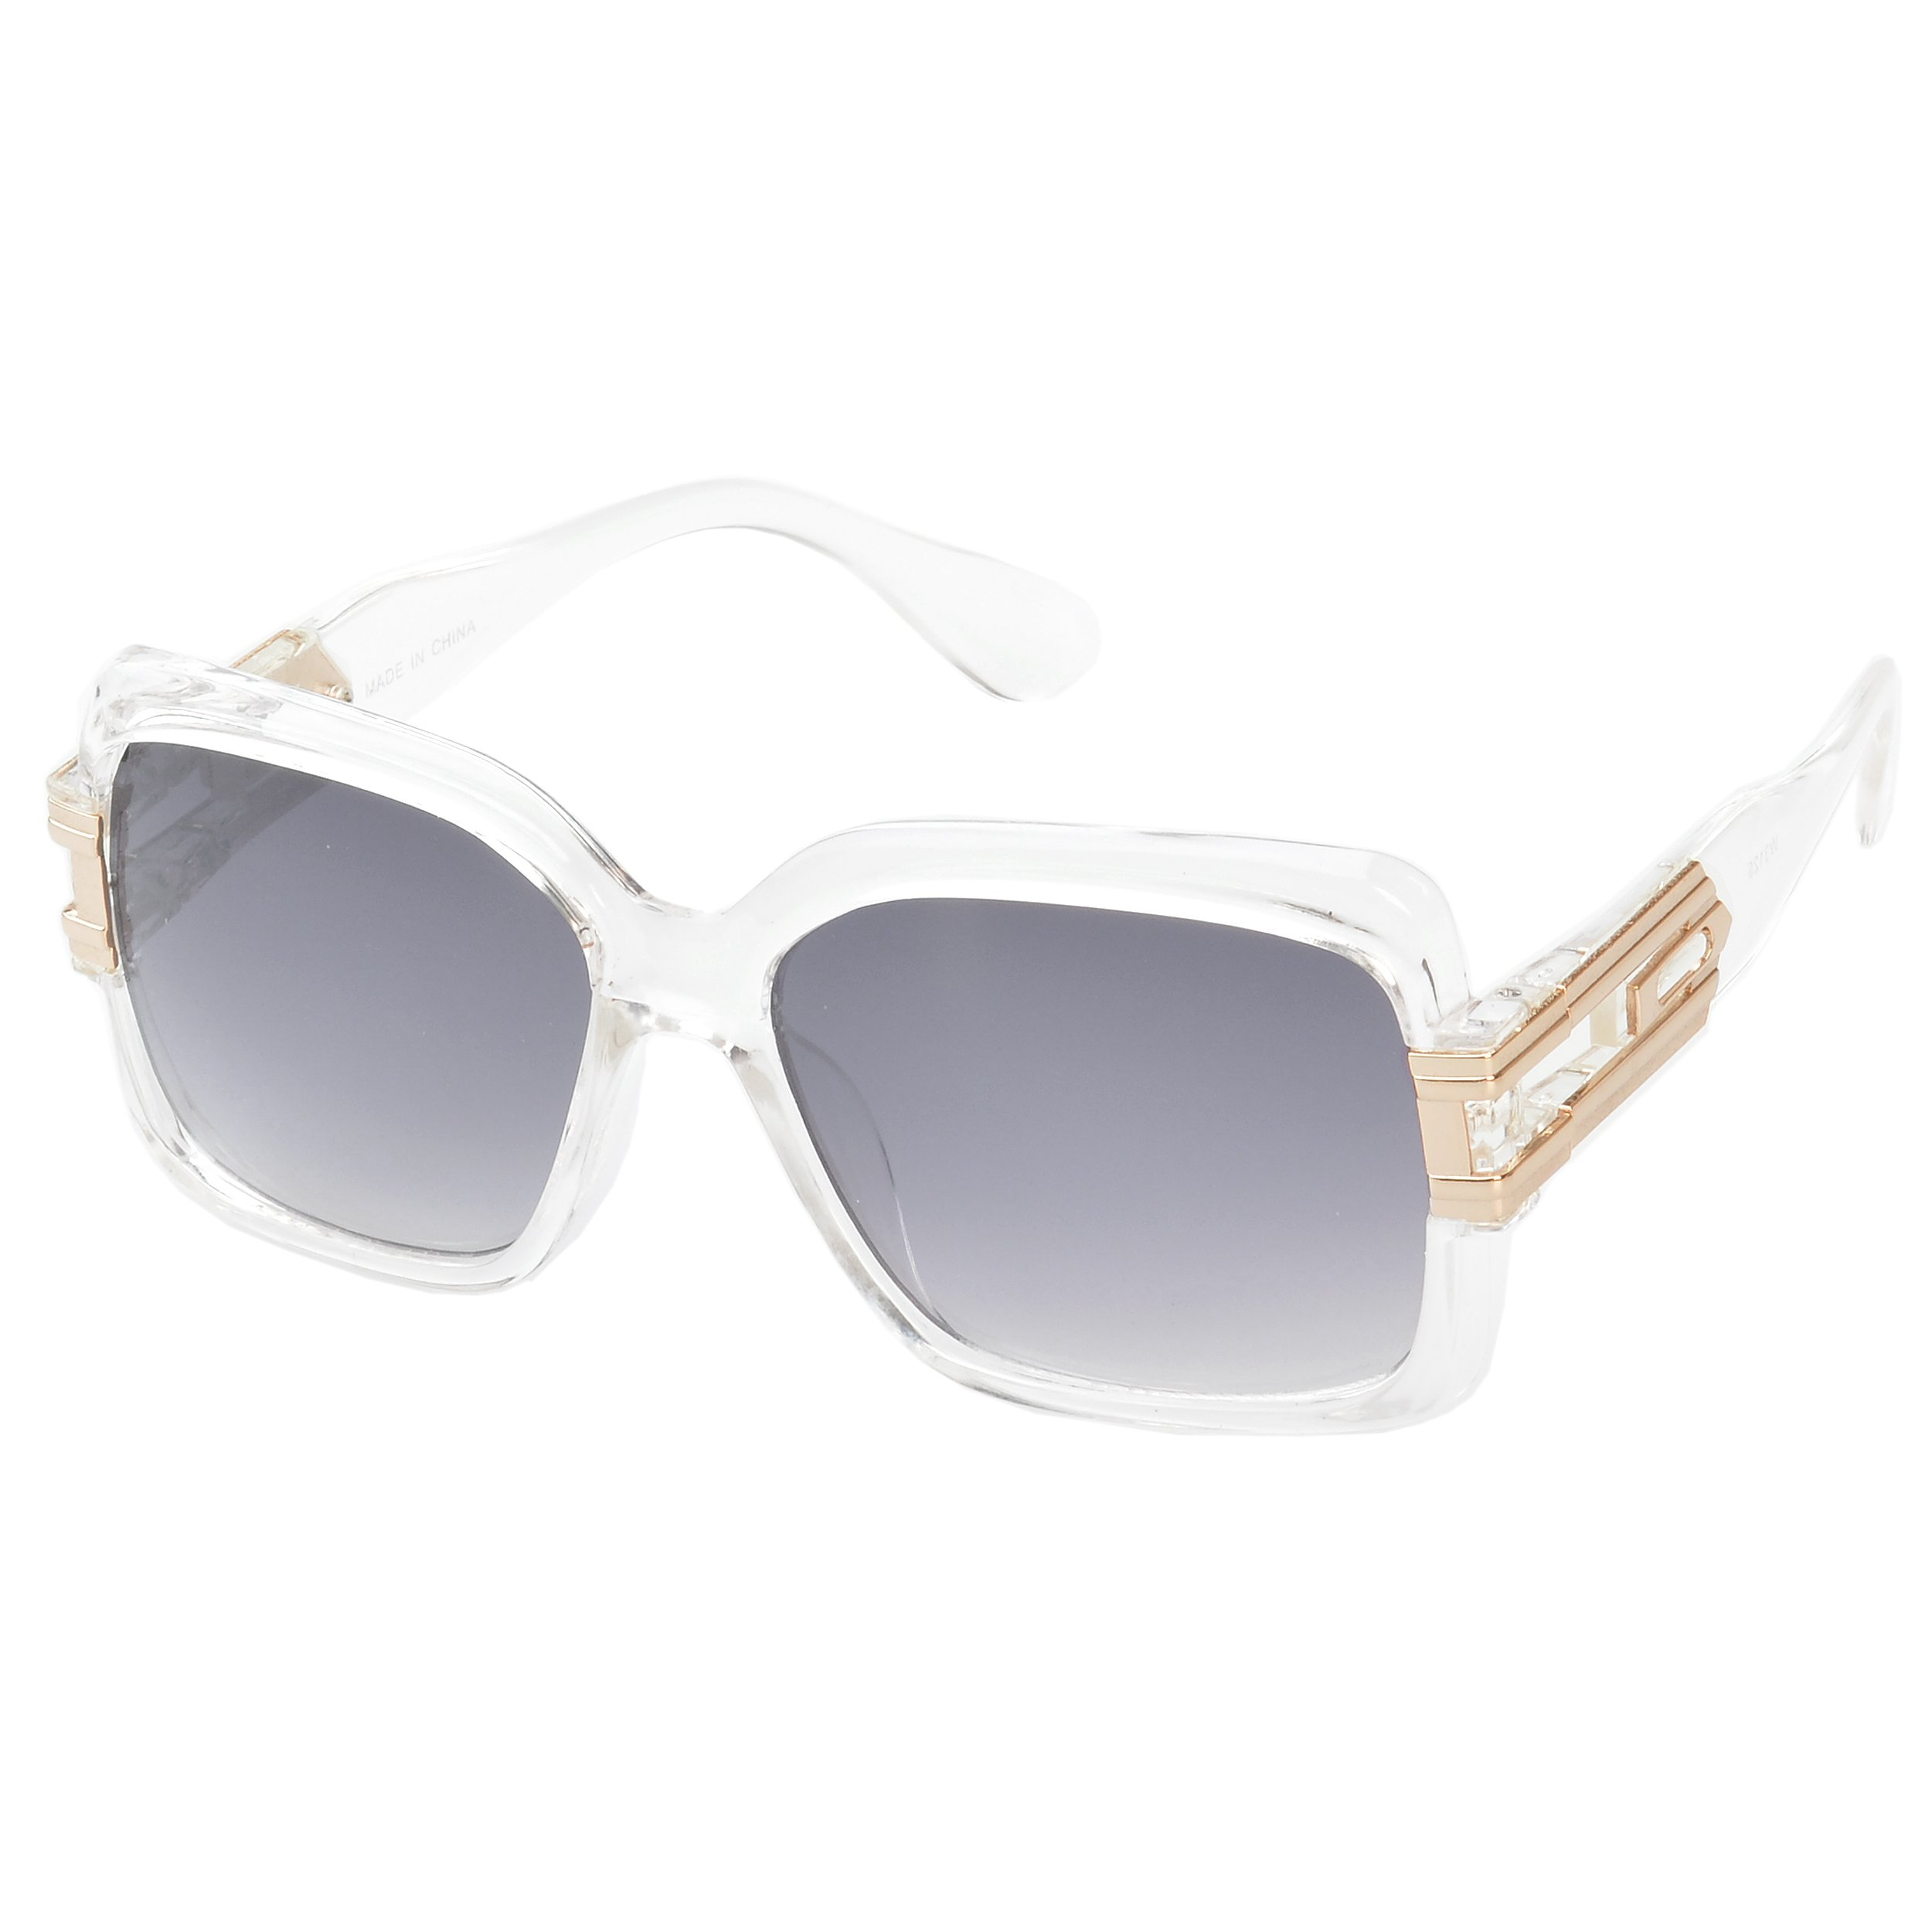 MLC Eyewear ® 'Remington' Square Fashion Sunglasses in Clear